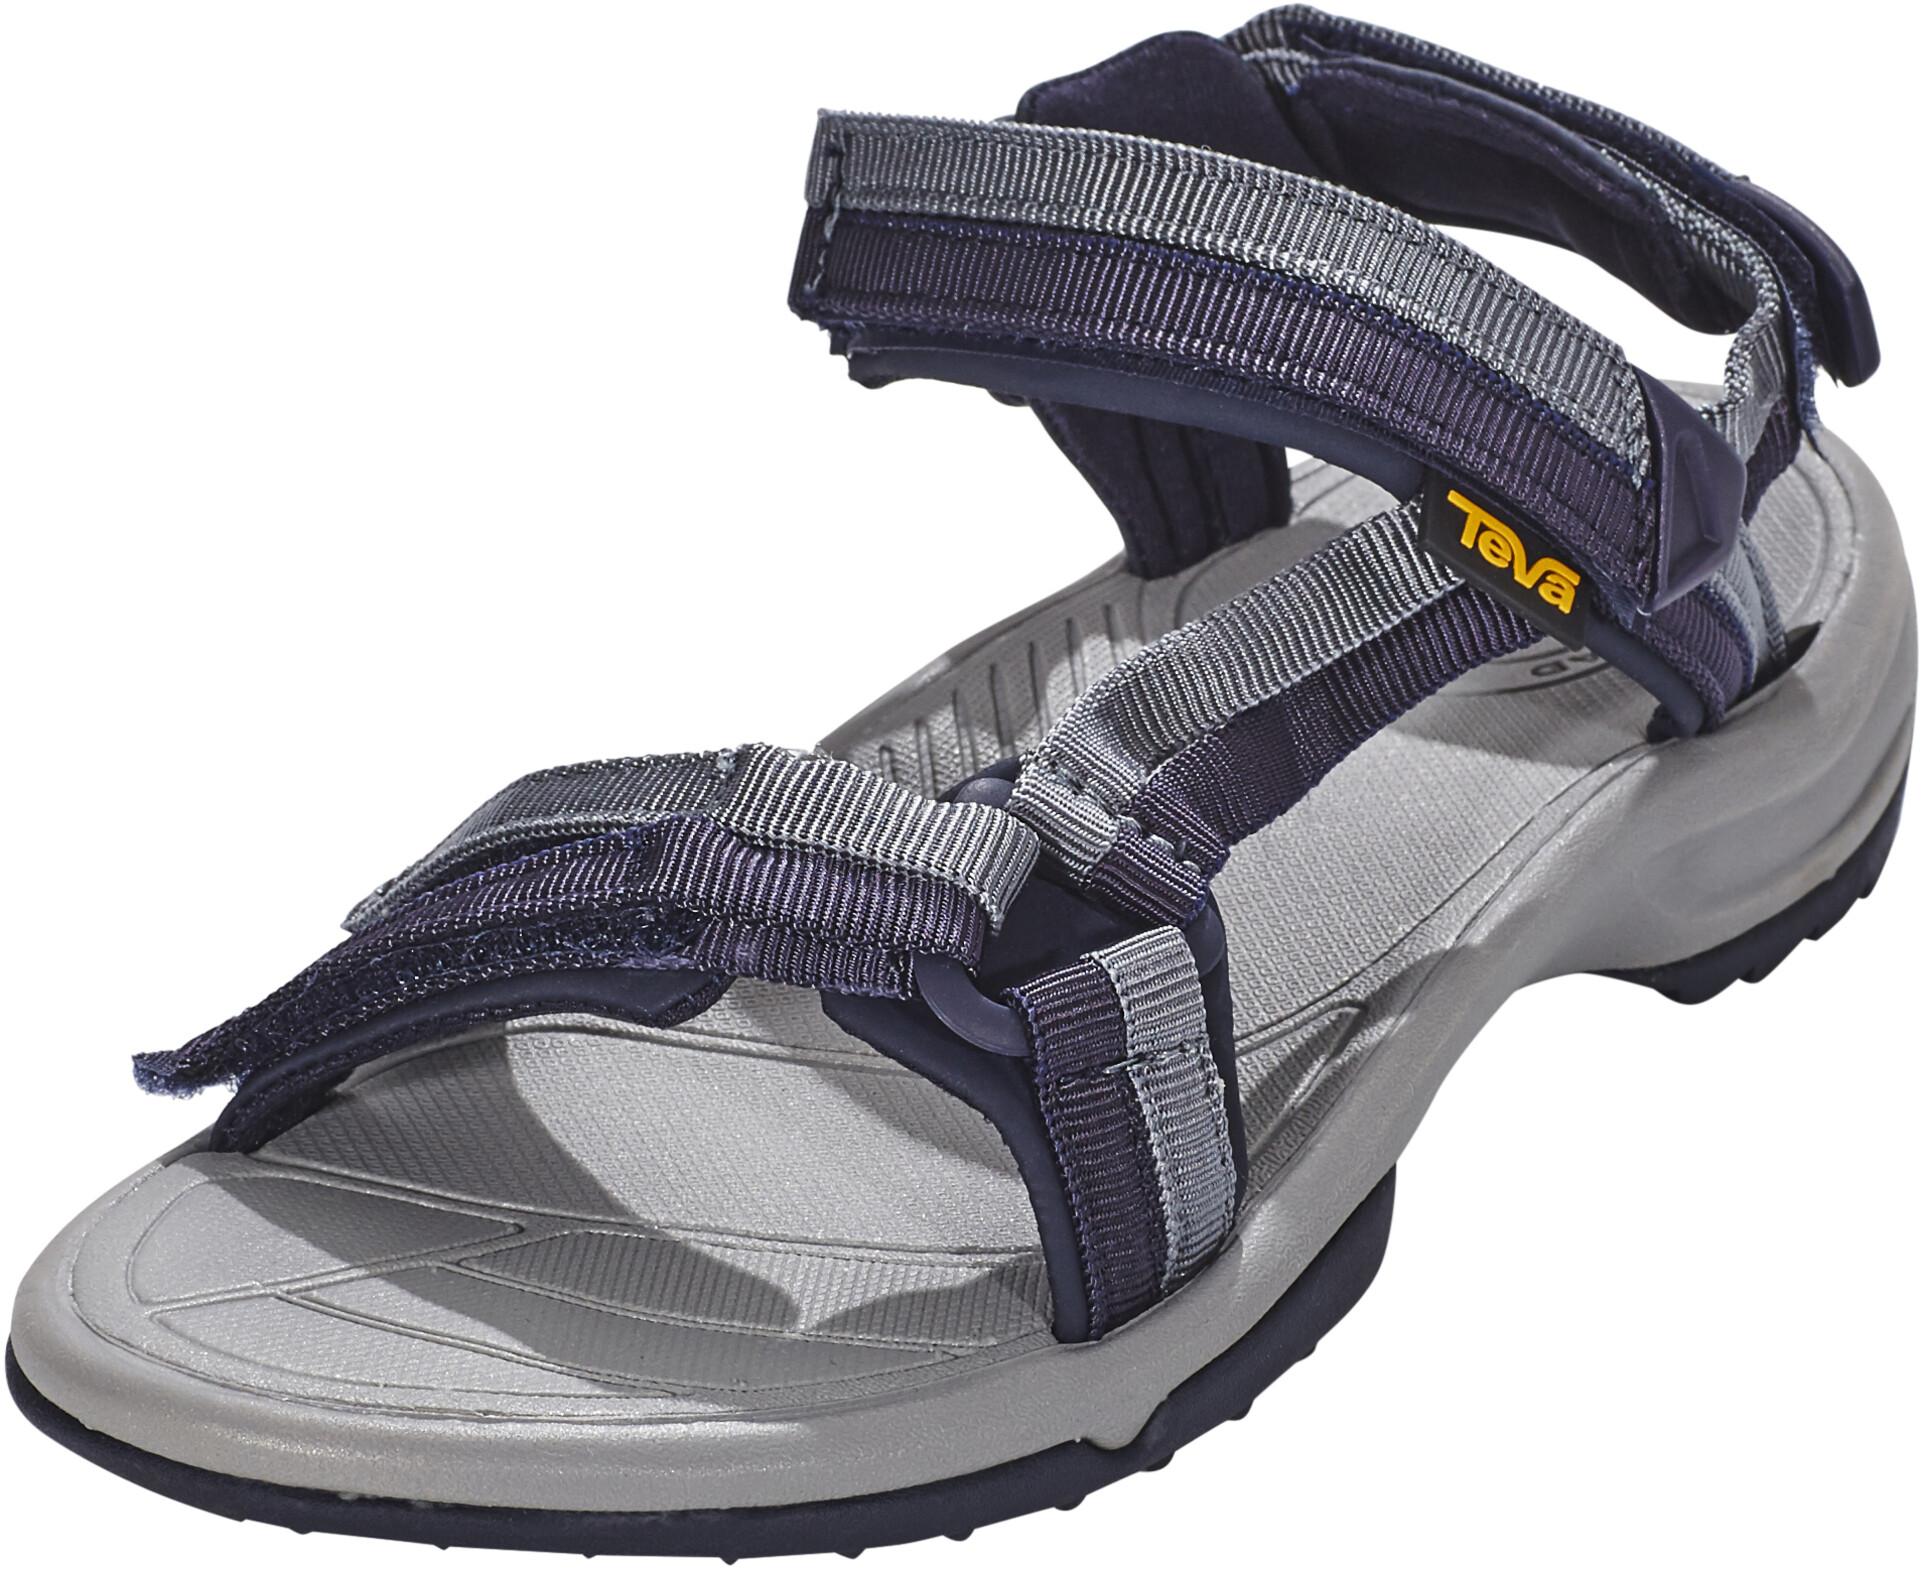 6b99714a56bf3 Teva Terra Fi Lite Sandals Women grey black at Addnature.co.uk